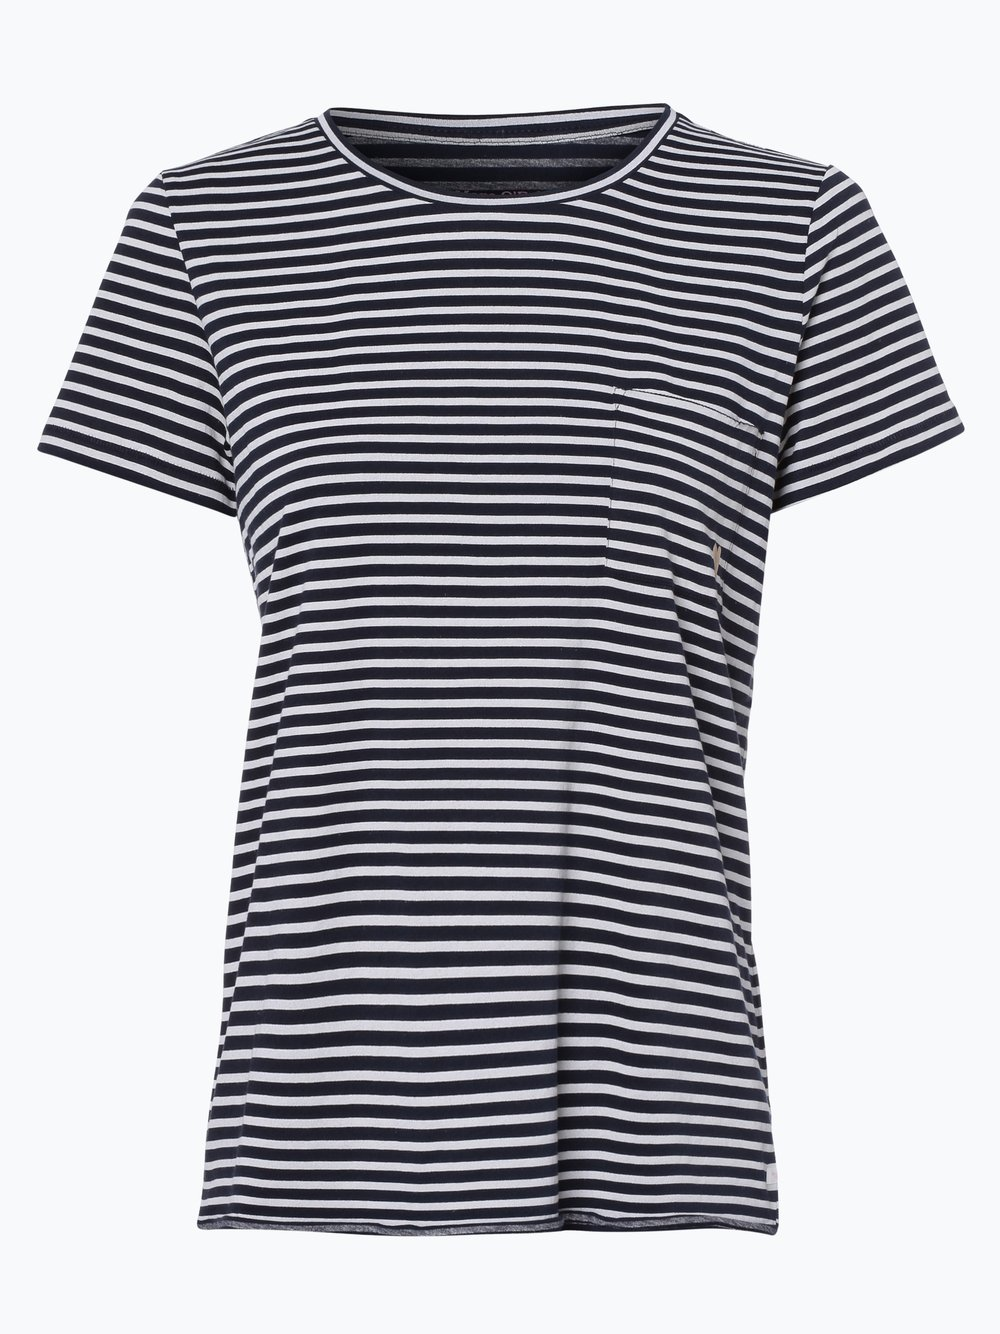 Marc O Polo Denim Damen T-Shirt online kaufen   VANGRAAF.COM c936f04362